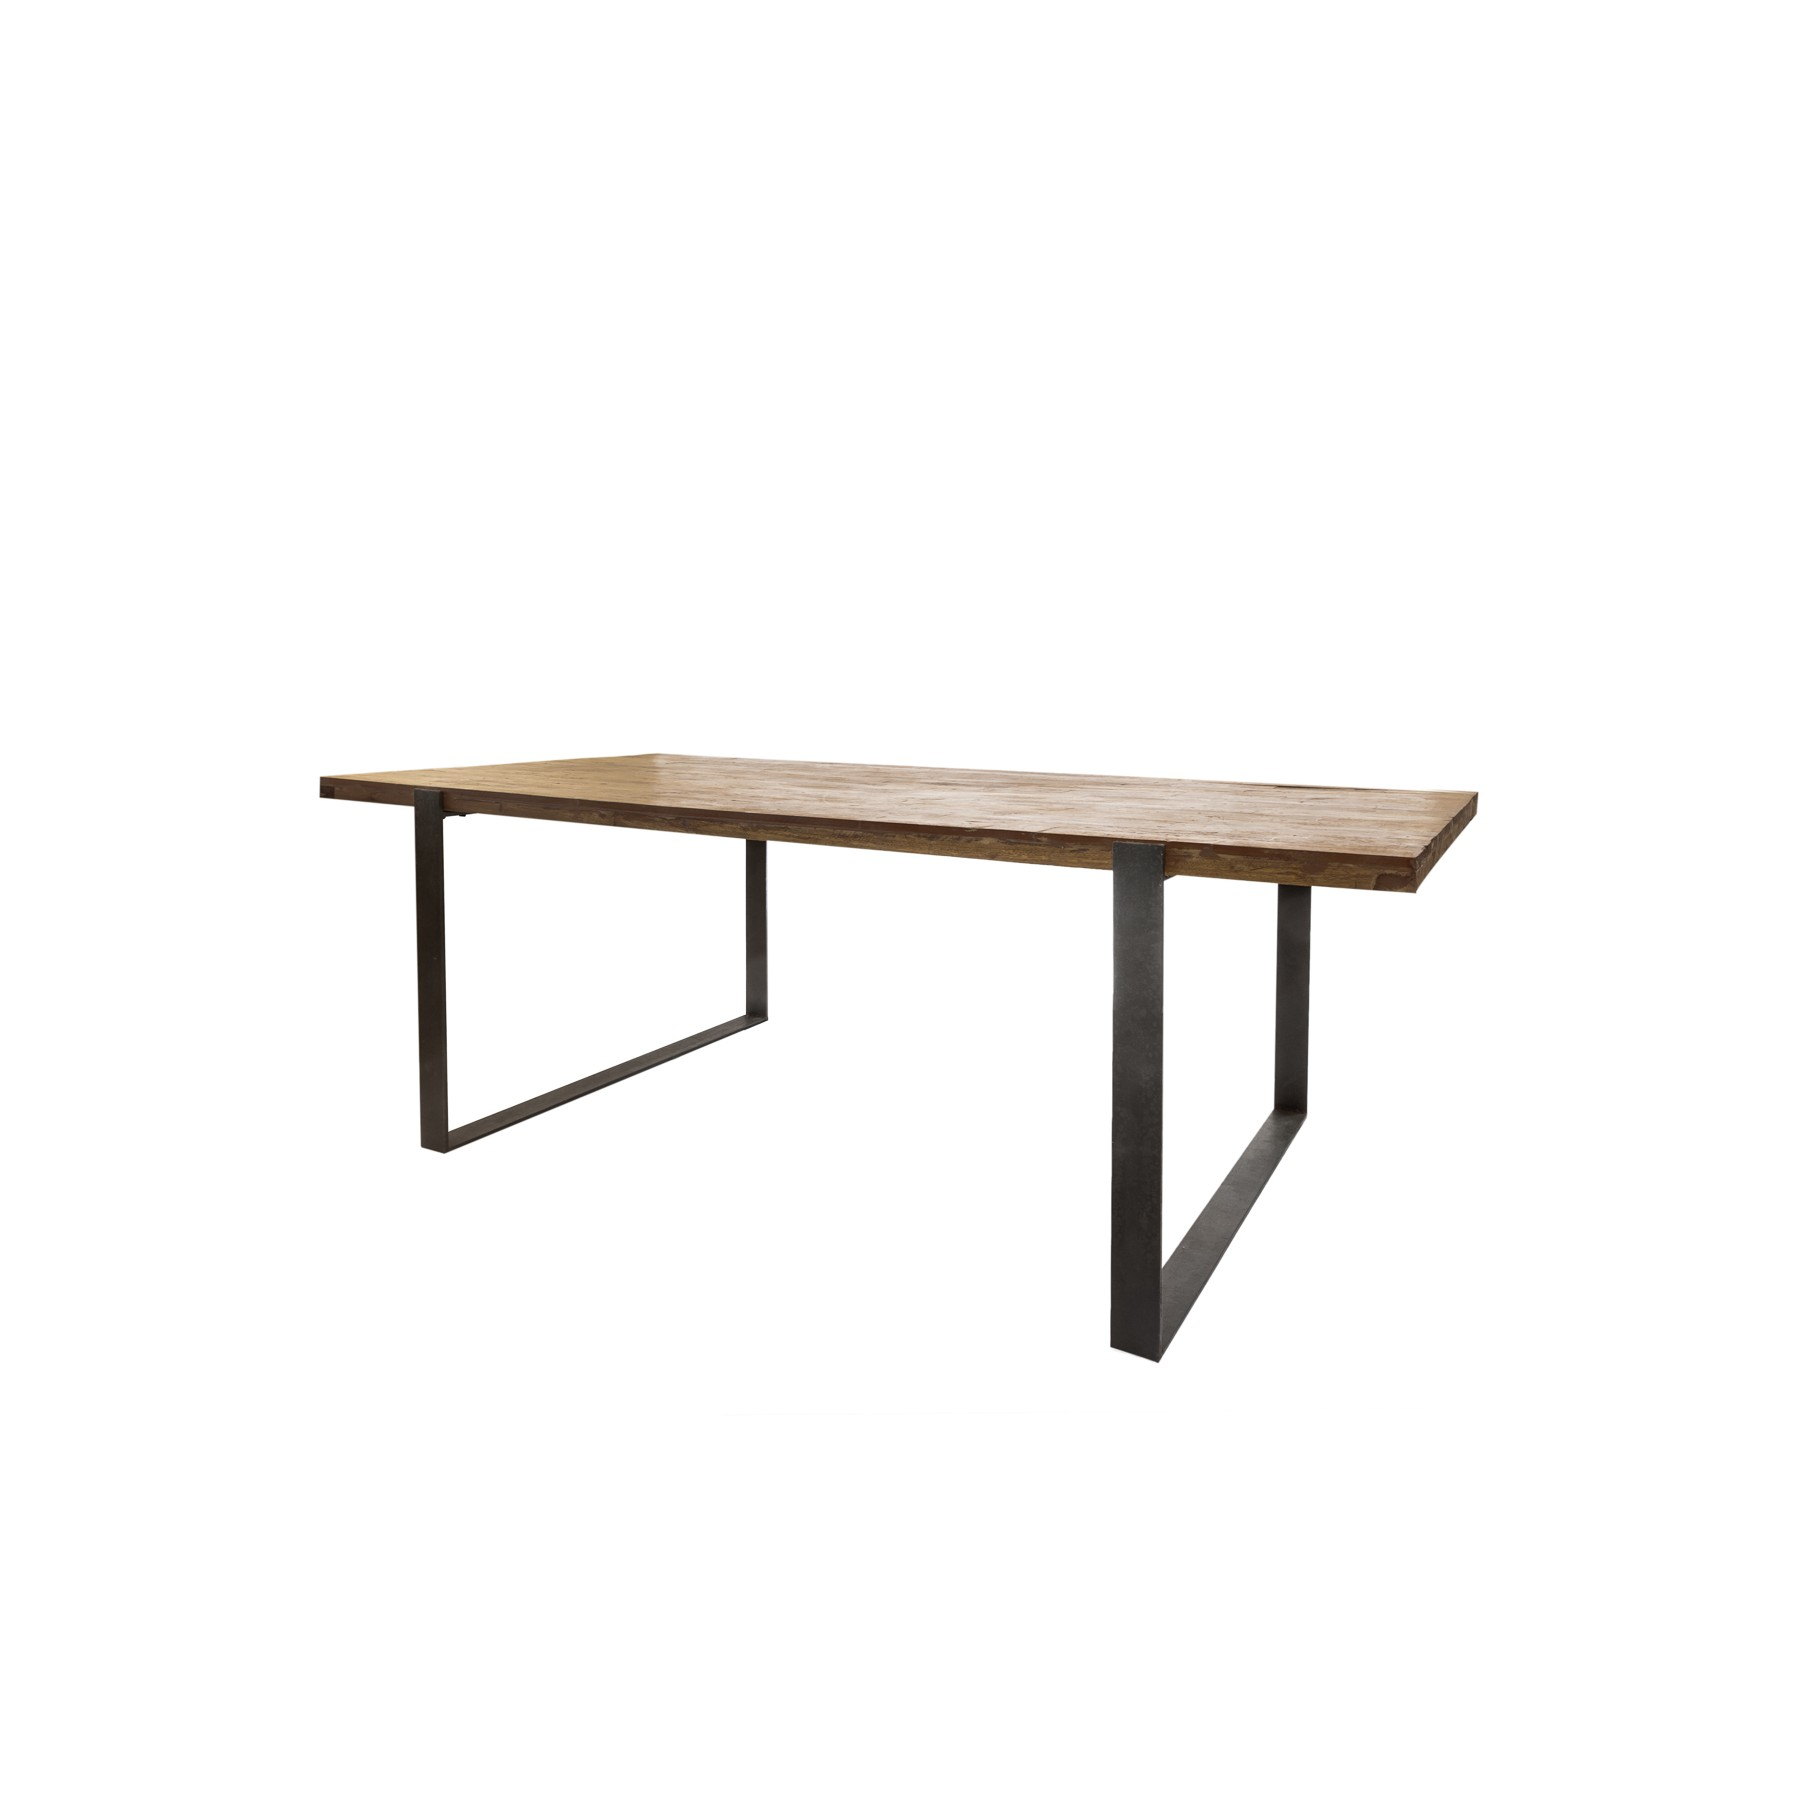 Mesas madera y hierro awesome madera suarhierro photo ag for Patas de hierro para mesas